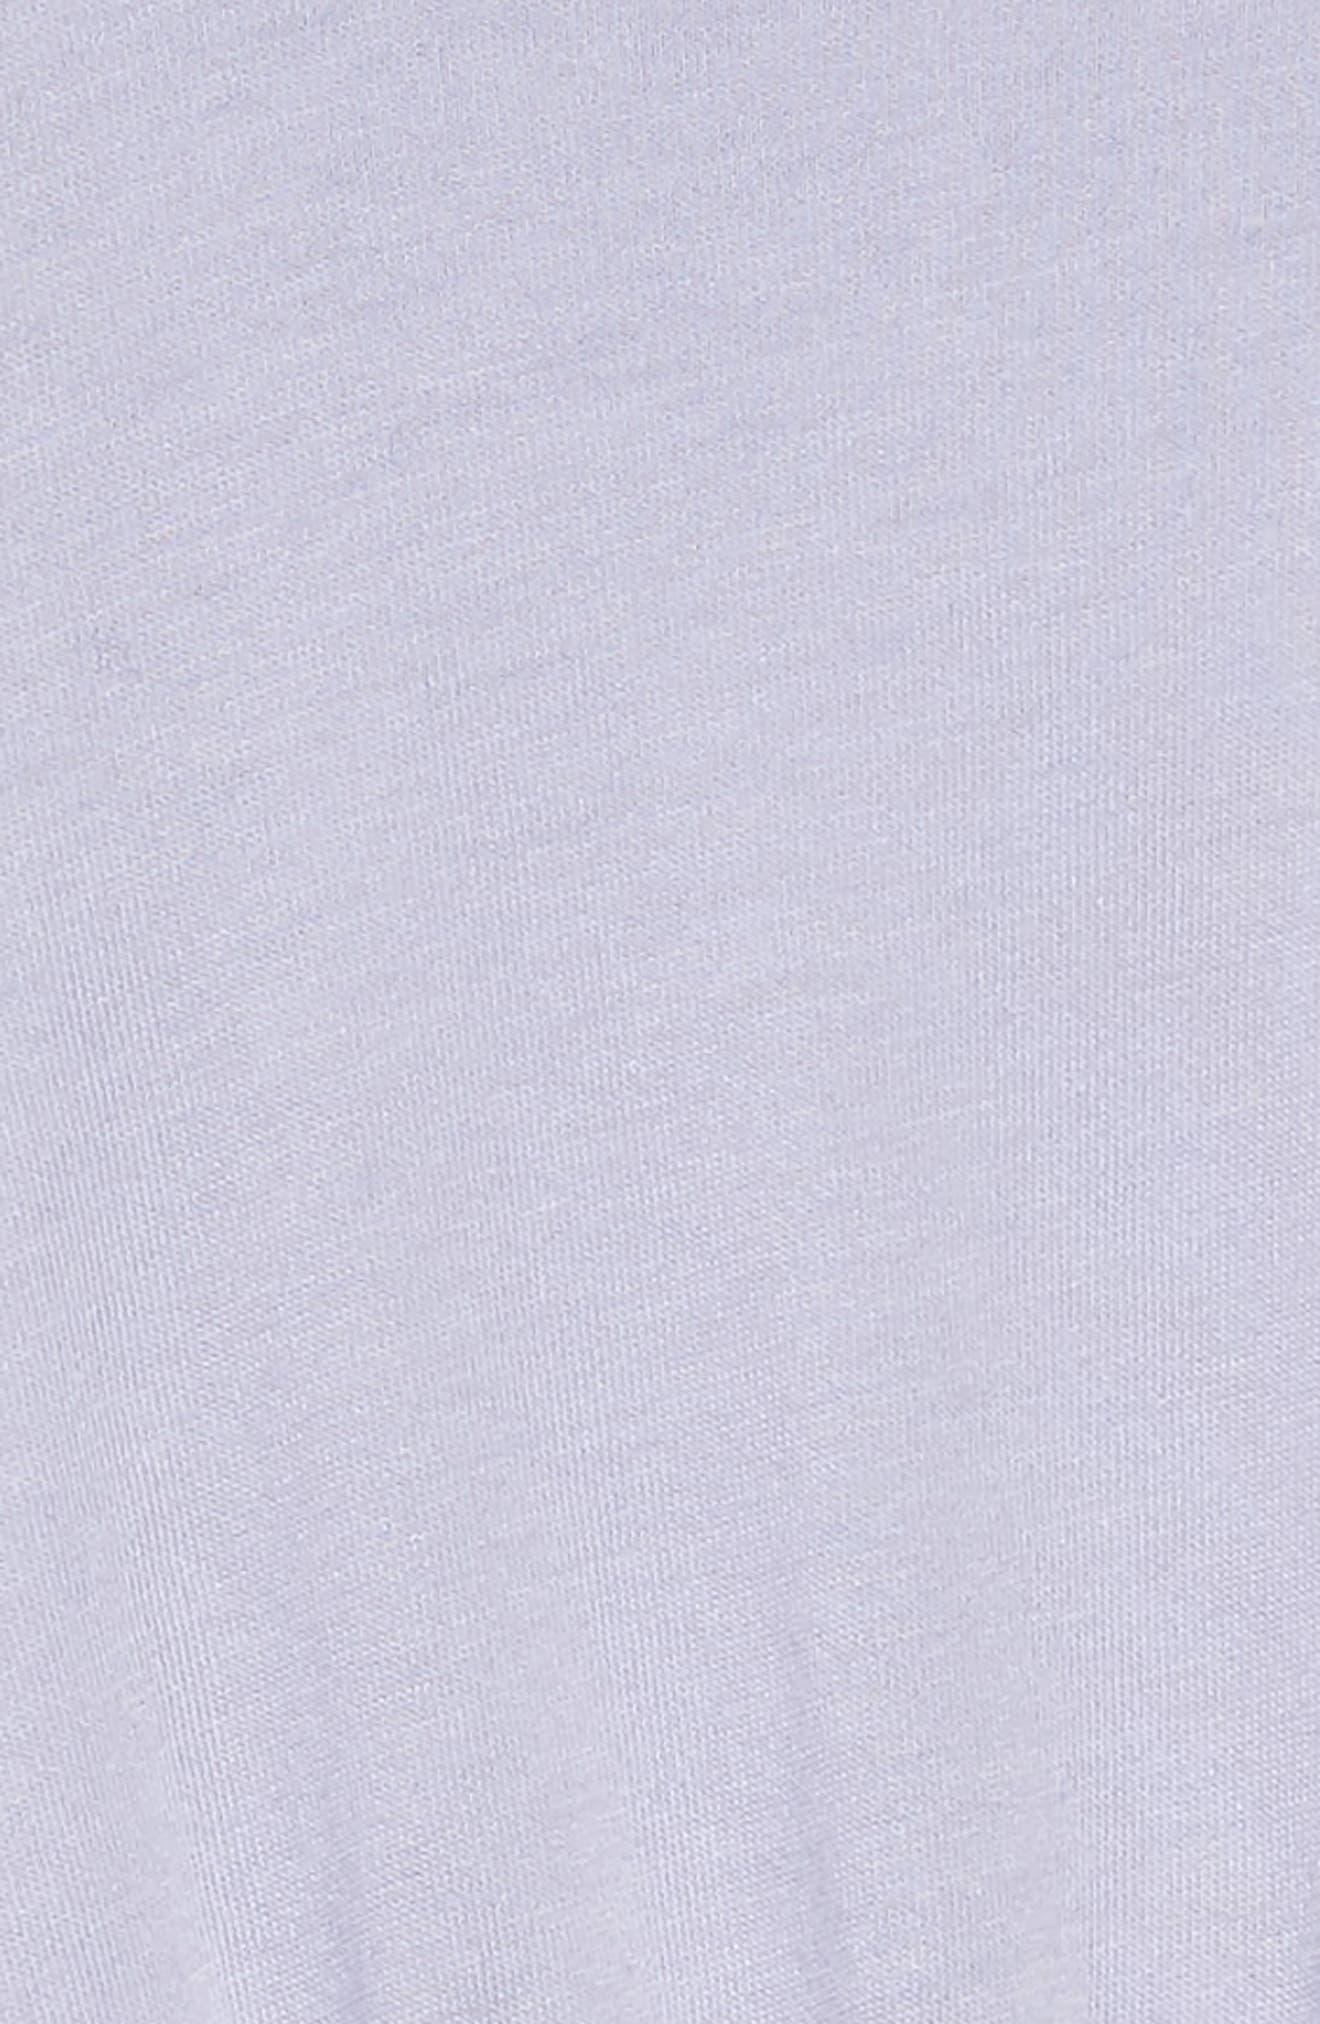 Ruffle Dress,                             Alternate thumbnail 3, color,                             530